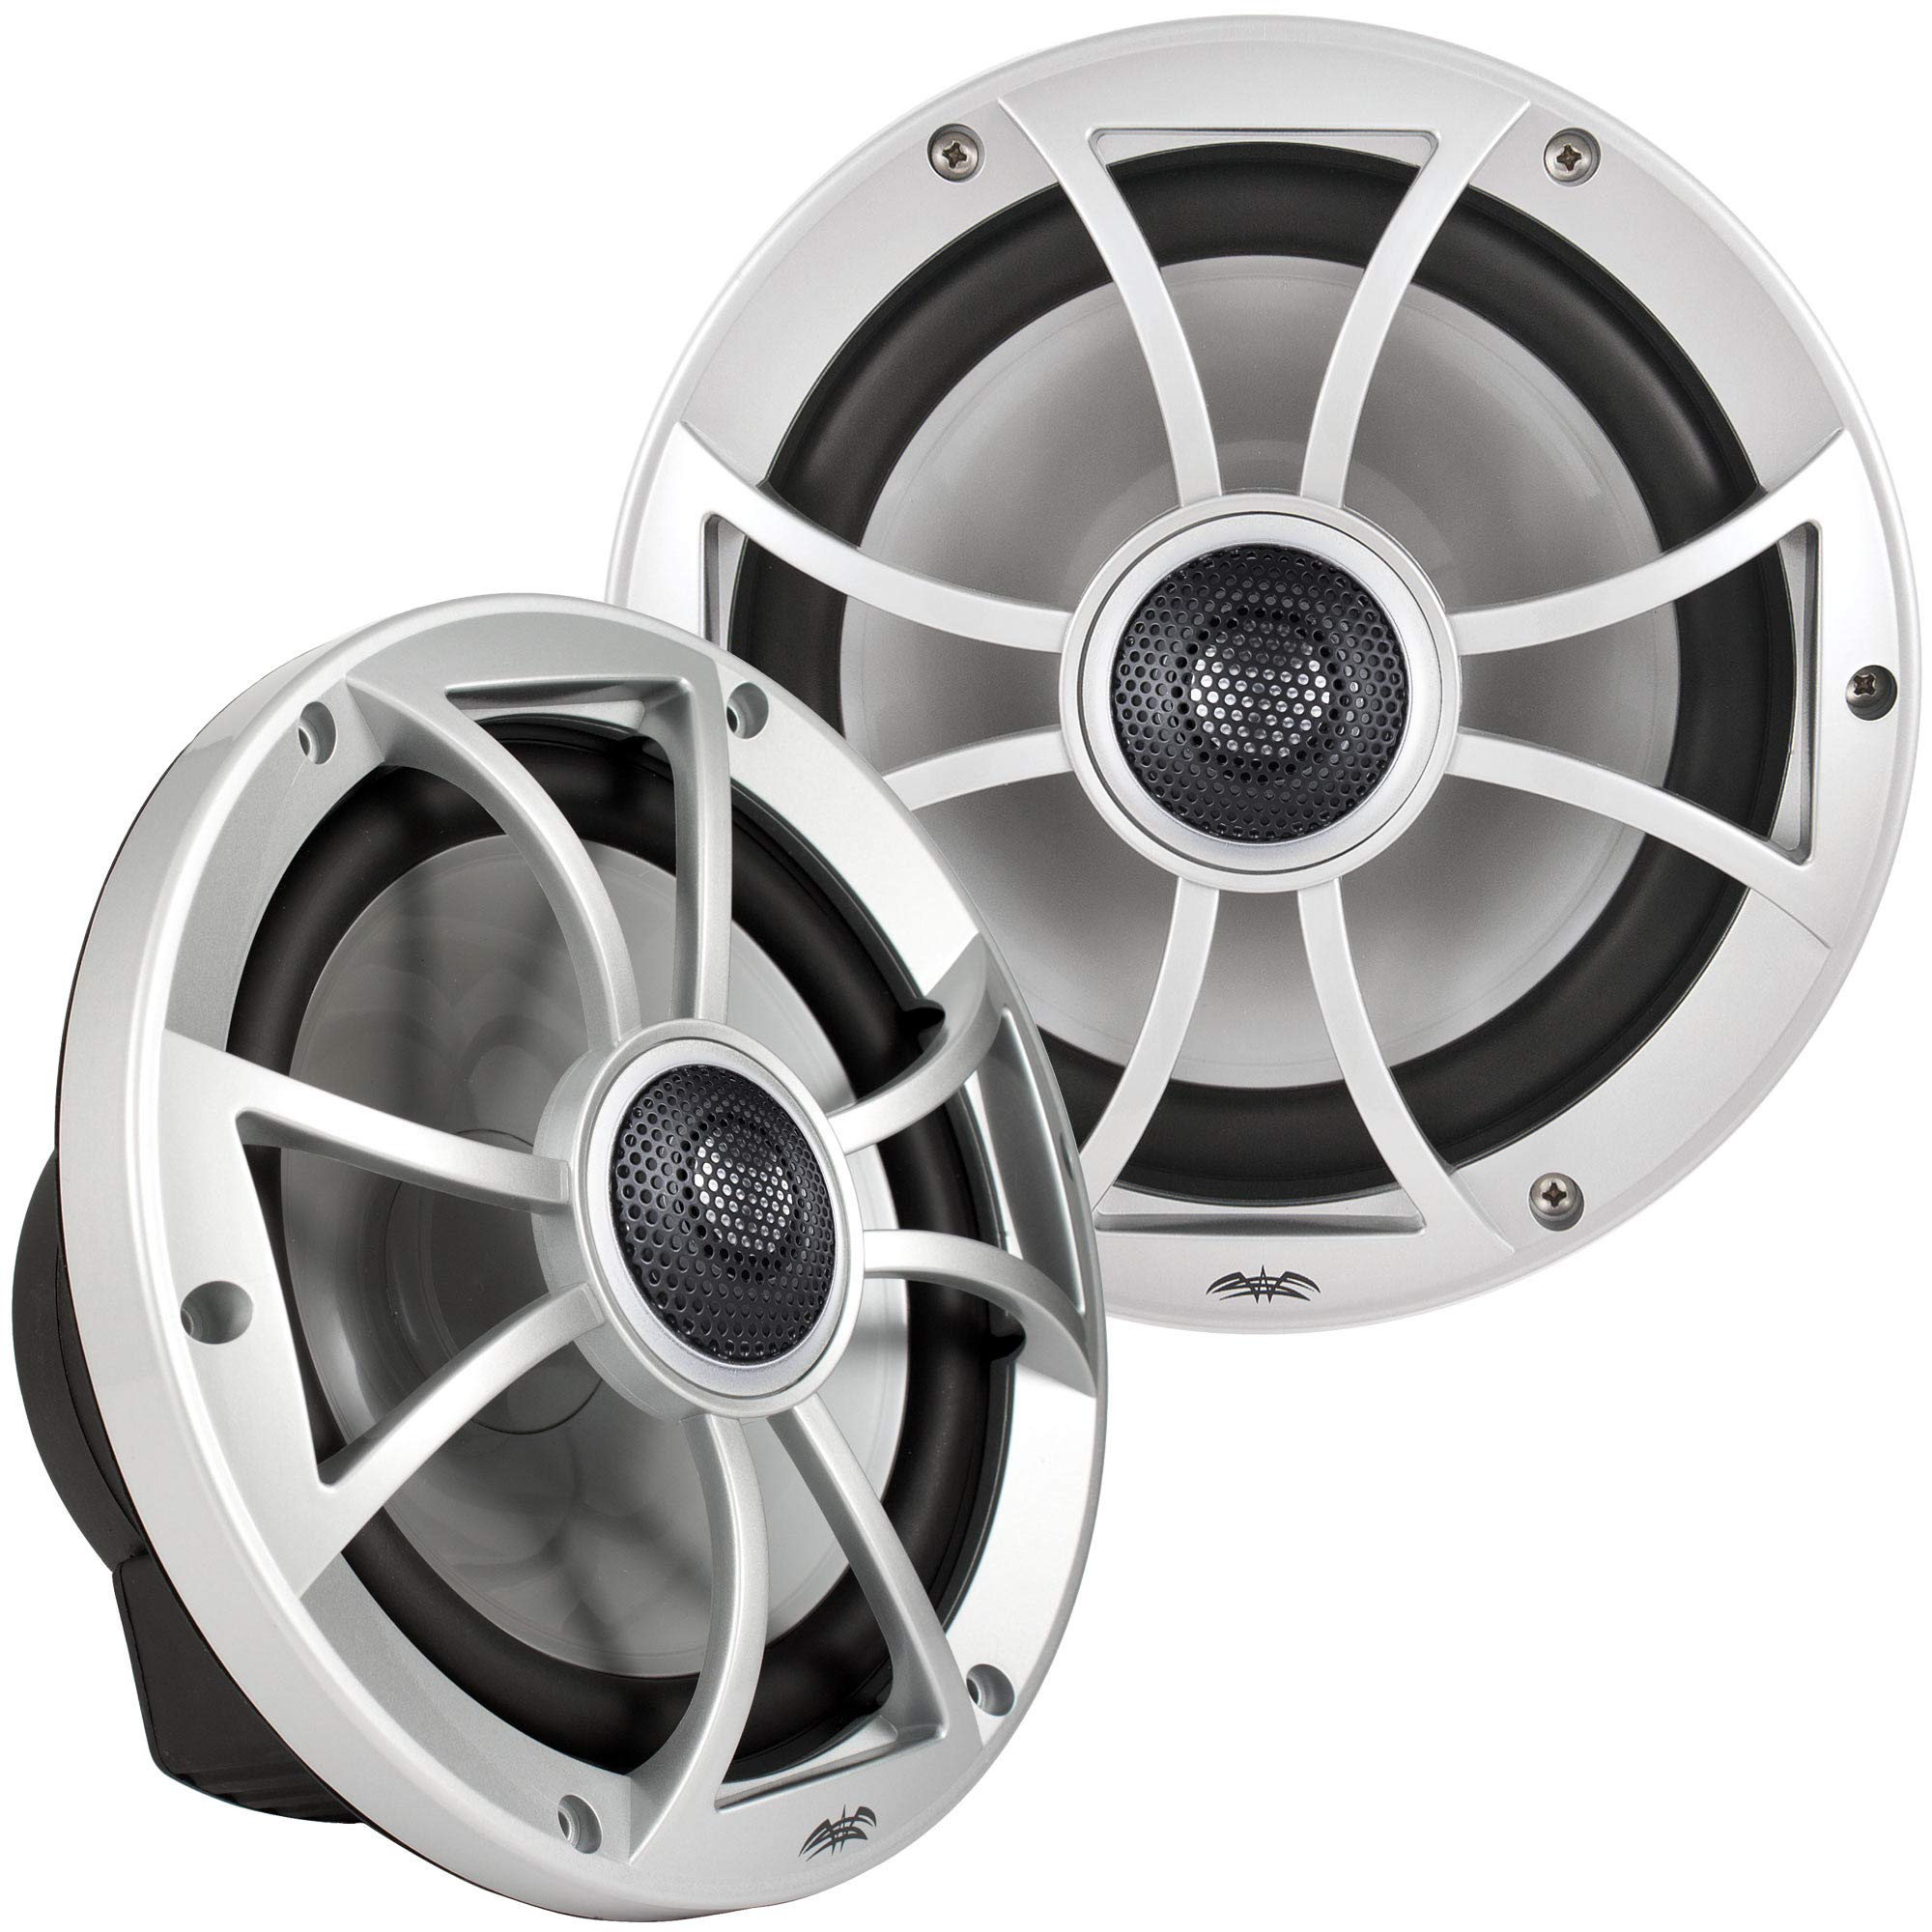 Renewed Sony XS-R4645 4 x 6 200W Max XSR Series 4-Way 4 ohms impedance Car Audio Coaxial Stereo Speakers